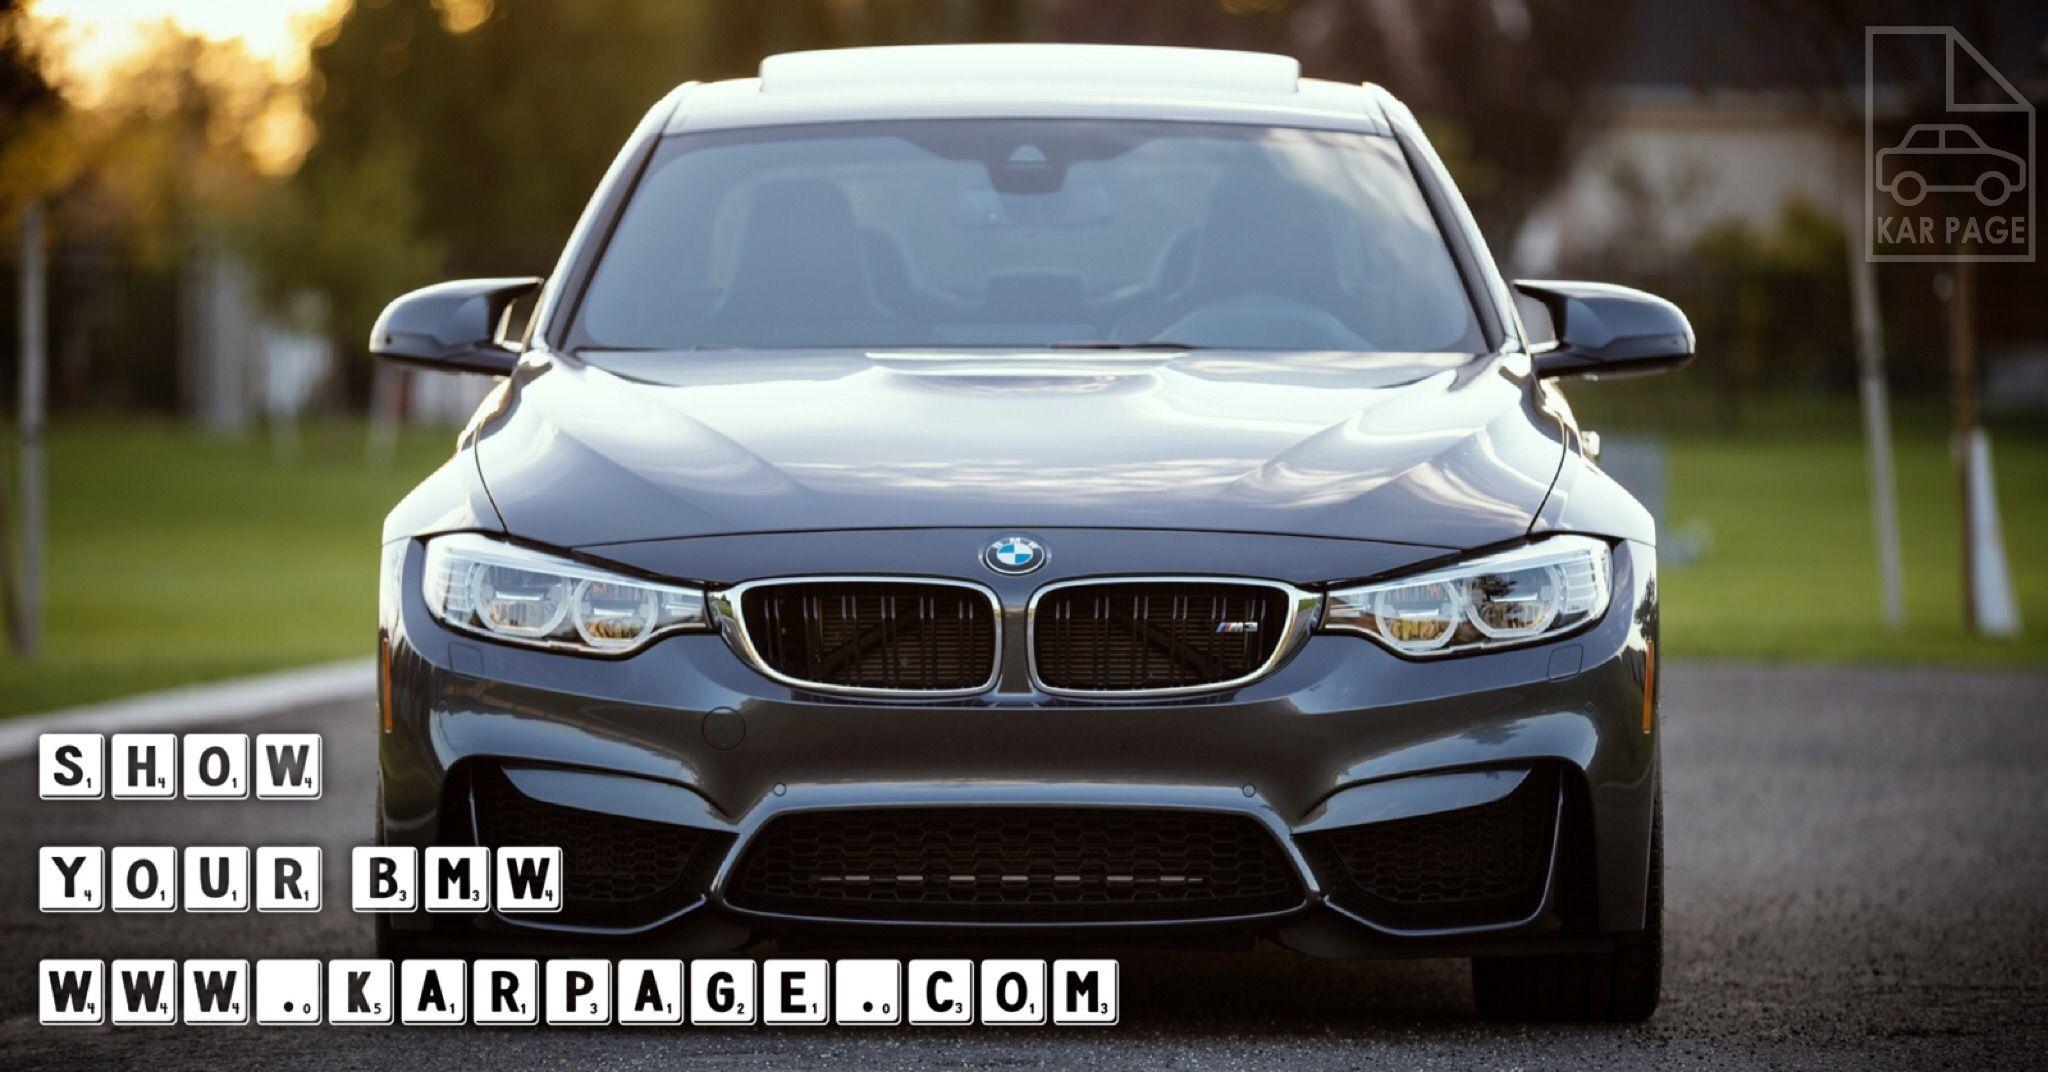 Show your BMW> bmw mpower m3 m4 m5 bmw2002 e21 e24